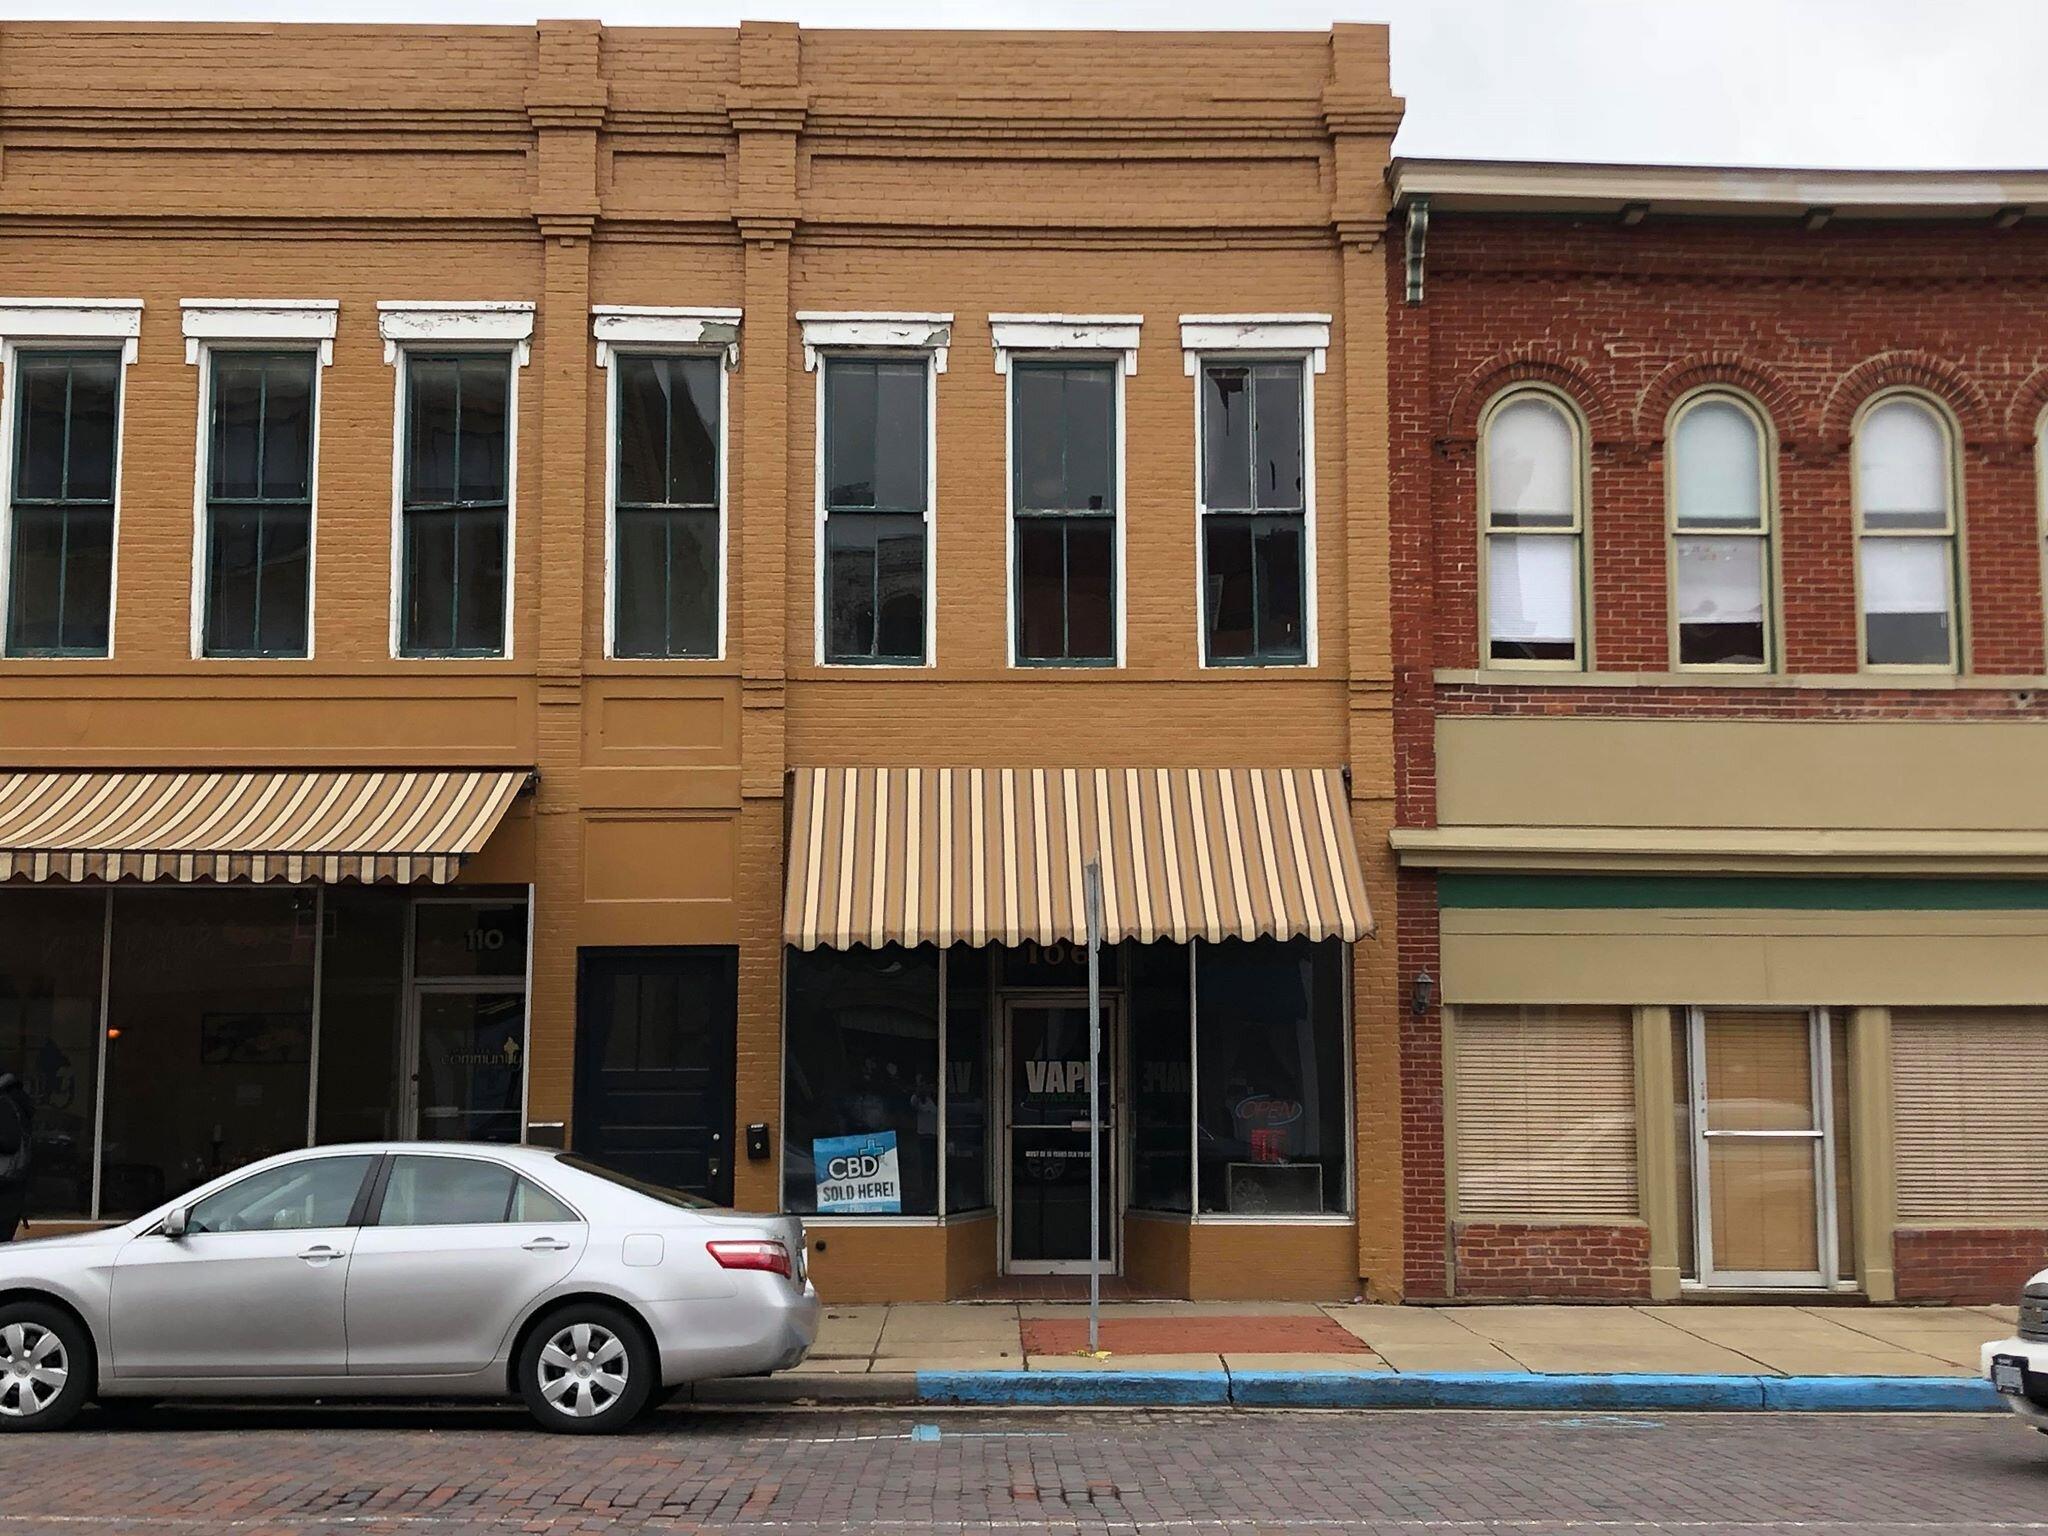 106 Putnam Street - Awning, Brick Repair, and Paint